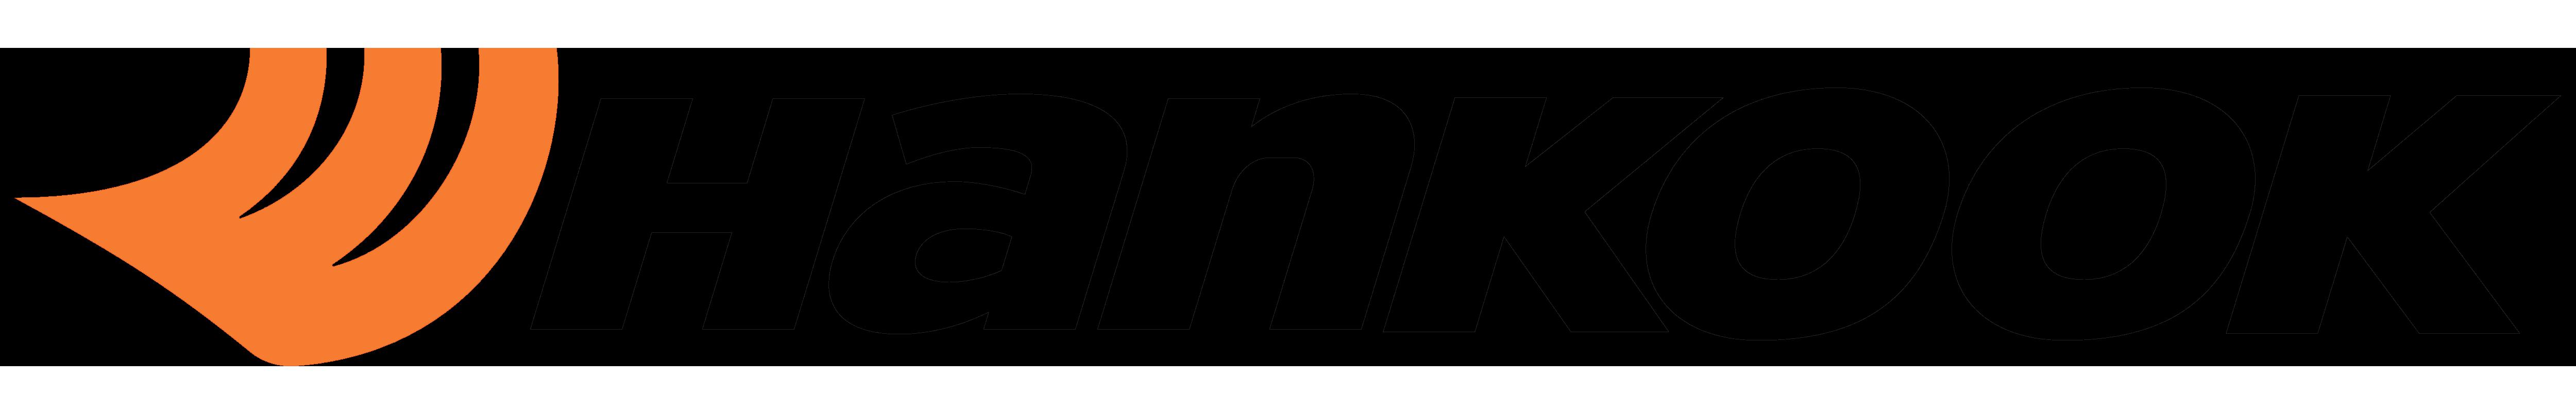 Hankook_logo_logotype